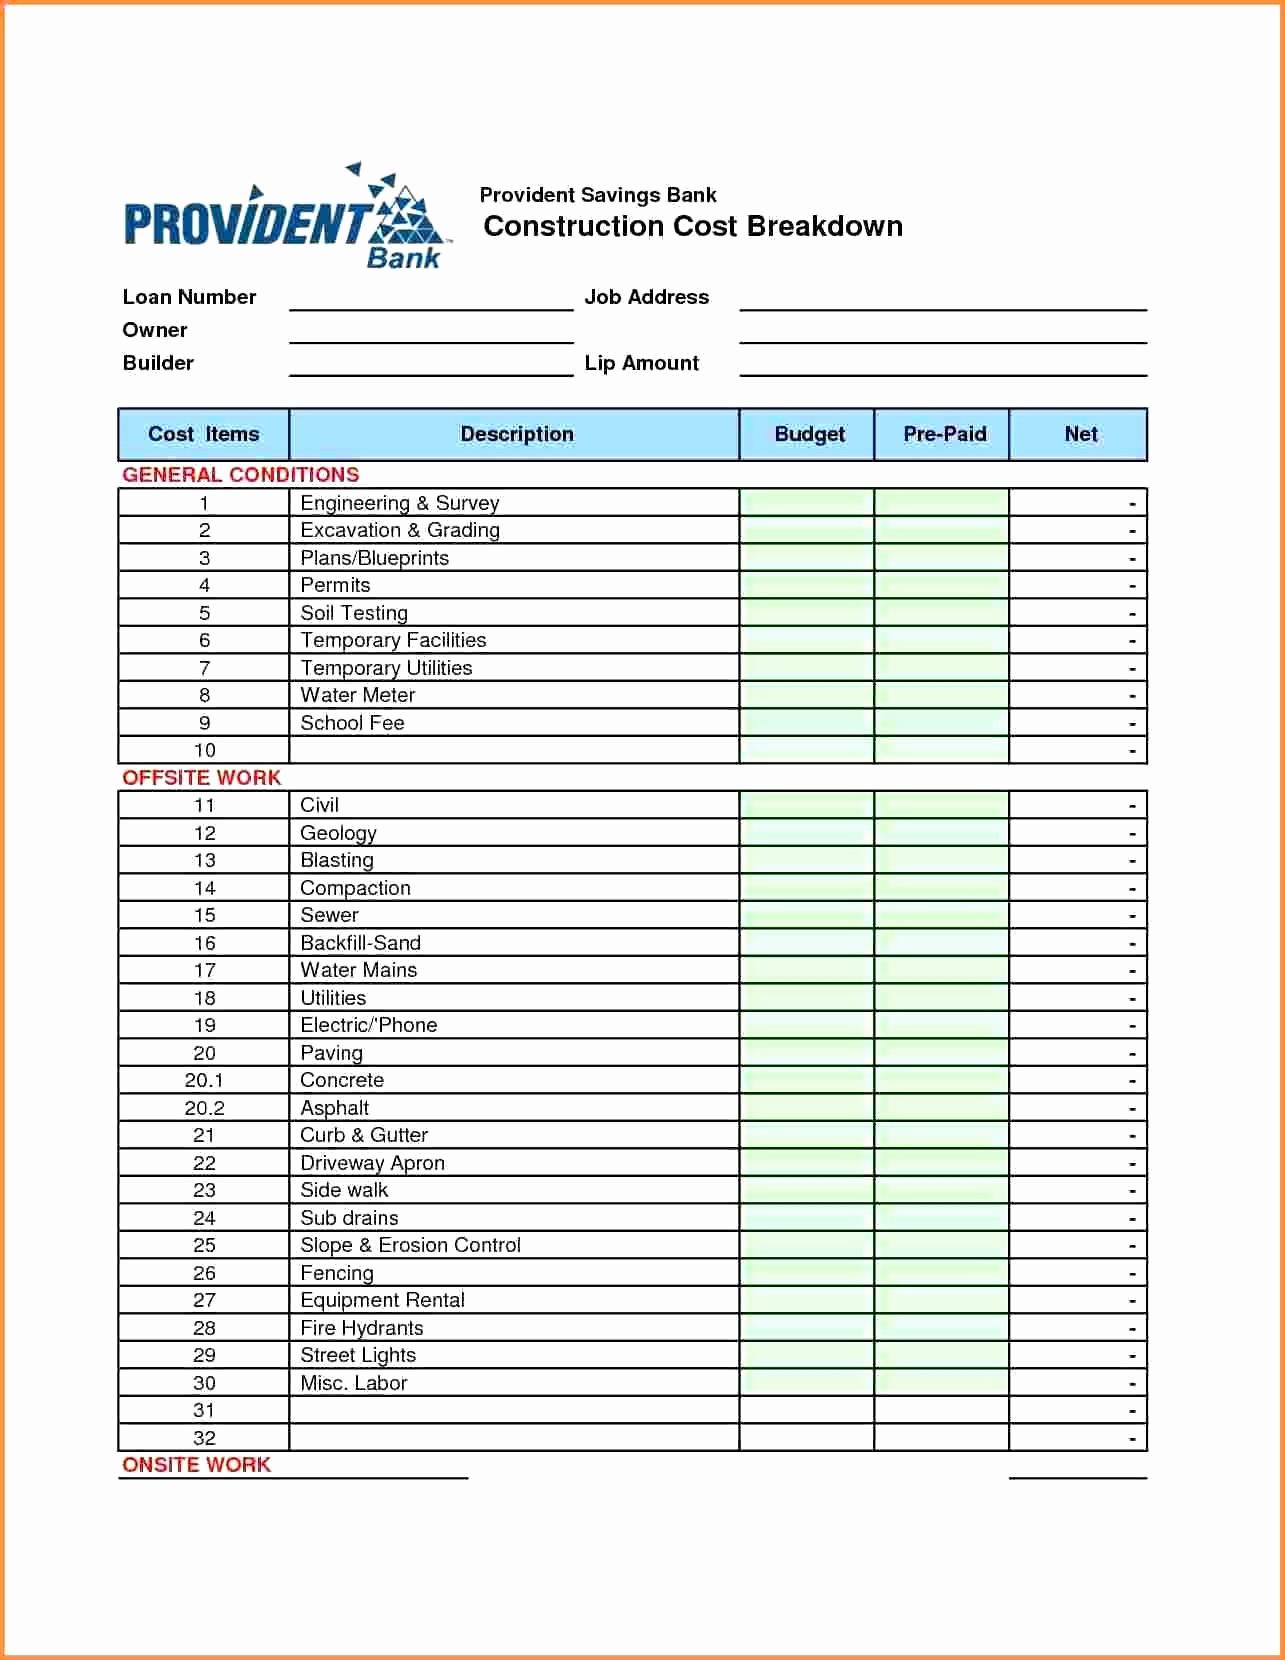 Food Cost Inventory Spreadsheet Beautiful Food Calories Spreadsheet for Food Cost Inventory Spreadsheet